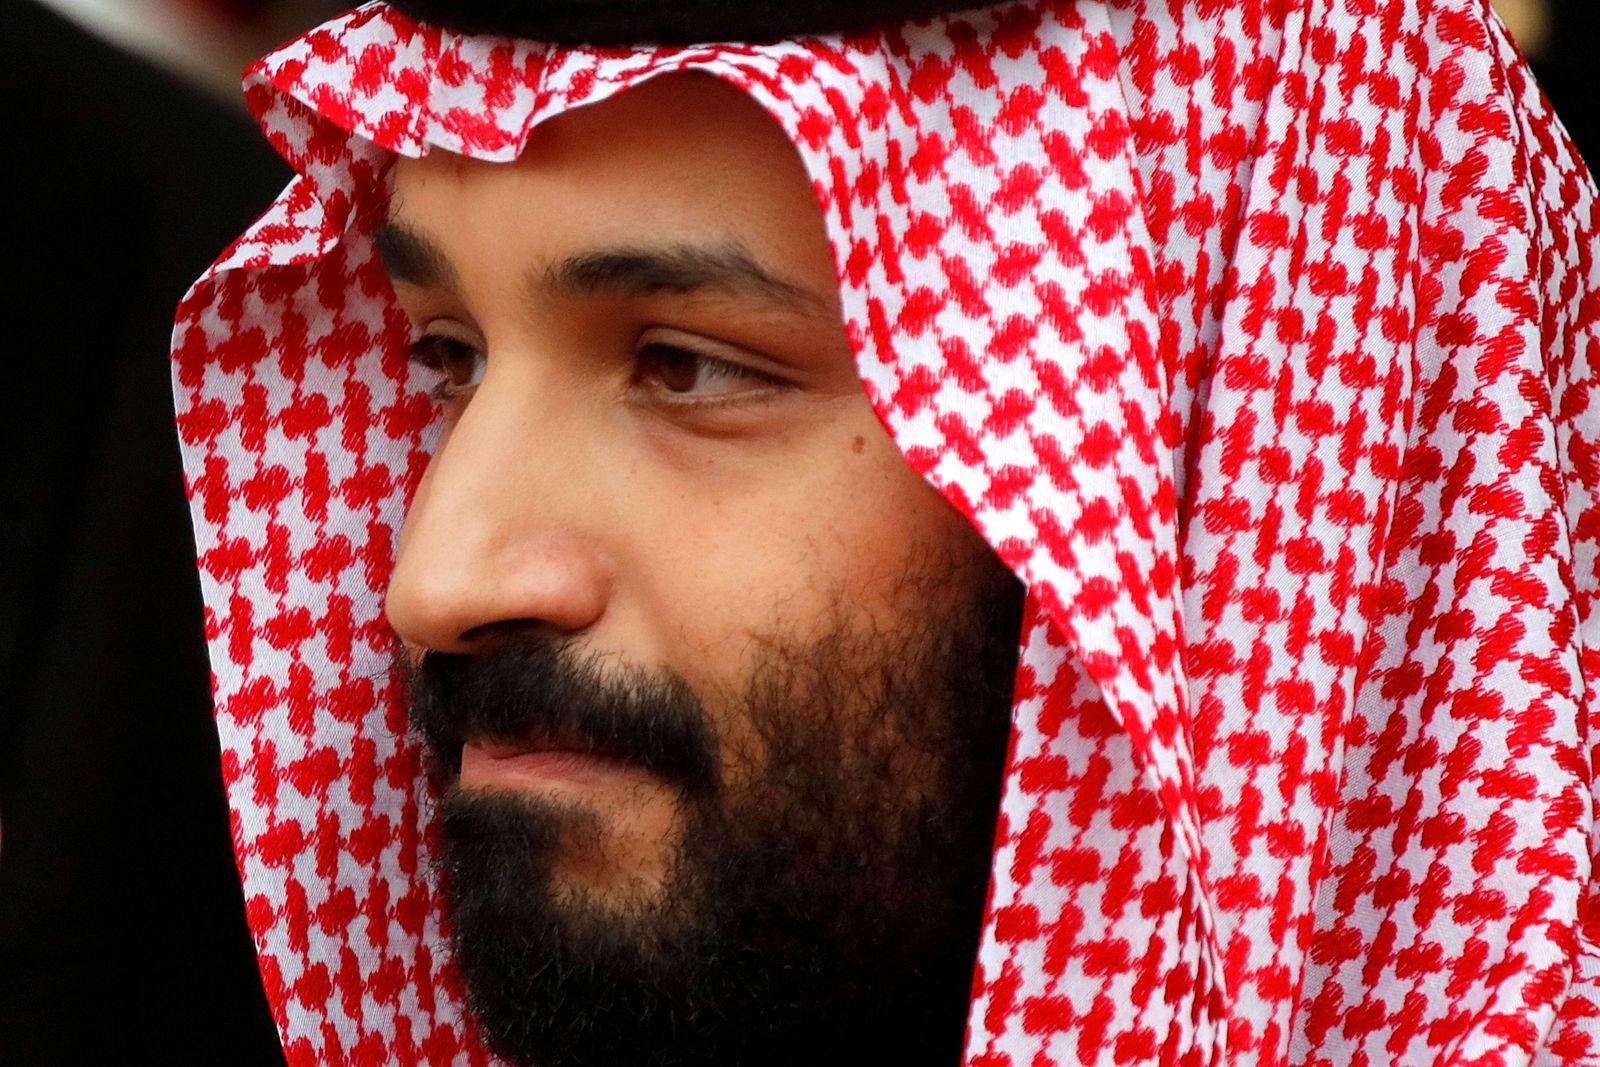 FILE PHOTO: Saudi Arabia's Crown Prince Mohammed bin Salman leaves the Hotel Matignon in Paris, France